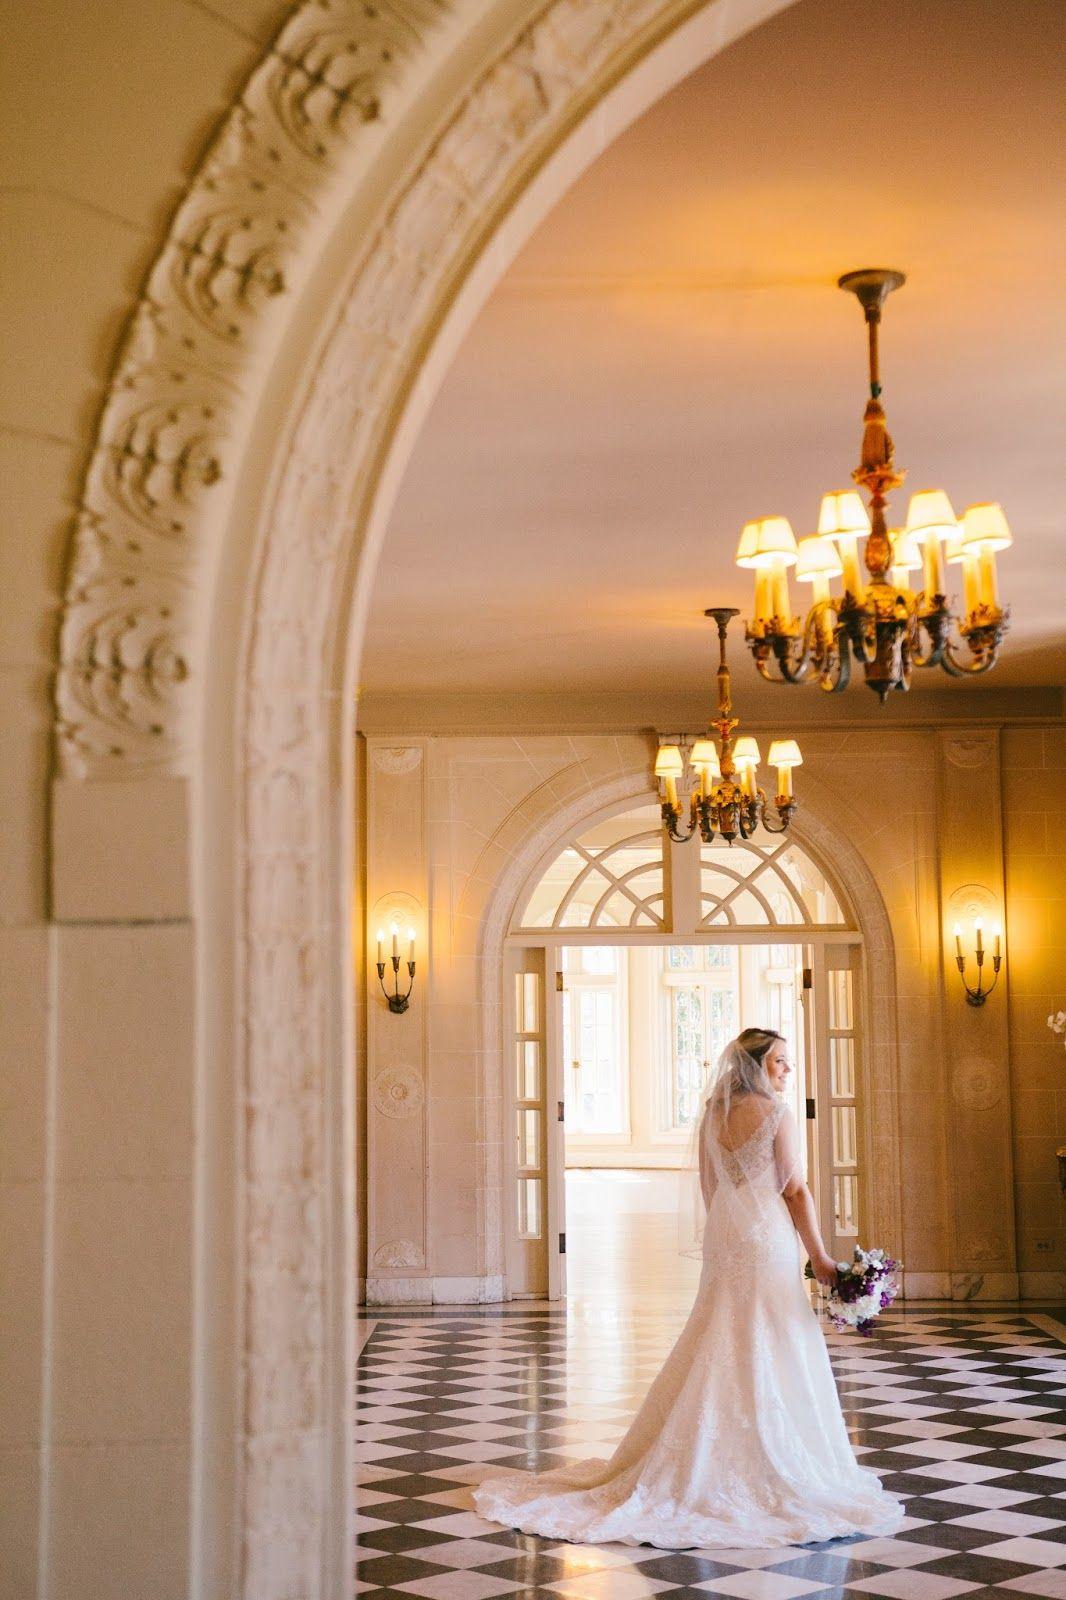 From Brittu0027s Eye View: Bridal Session At Tulsa Garden Center | Tulsa  Oklahoma Wedding Photographer